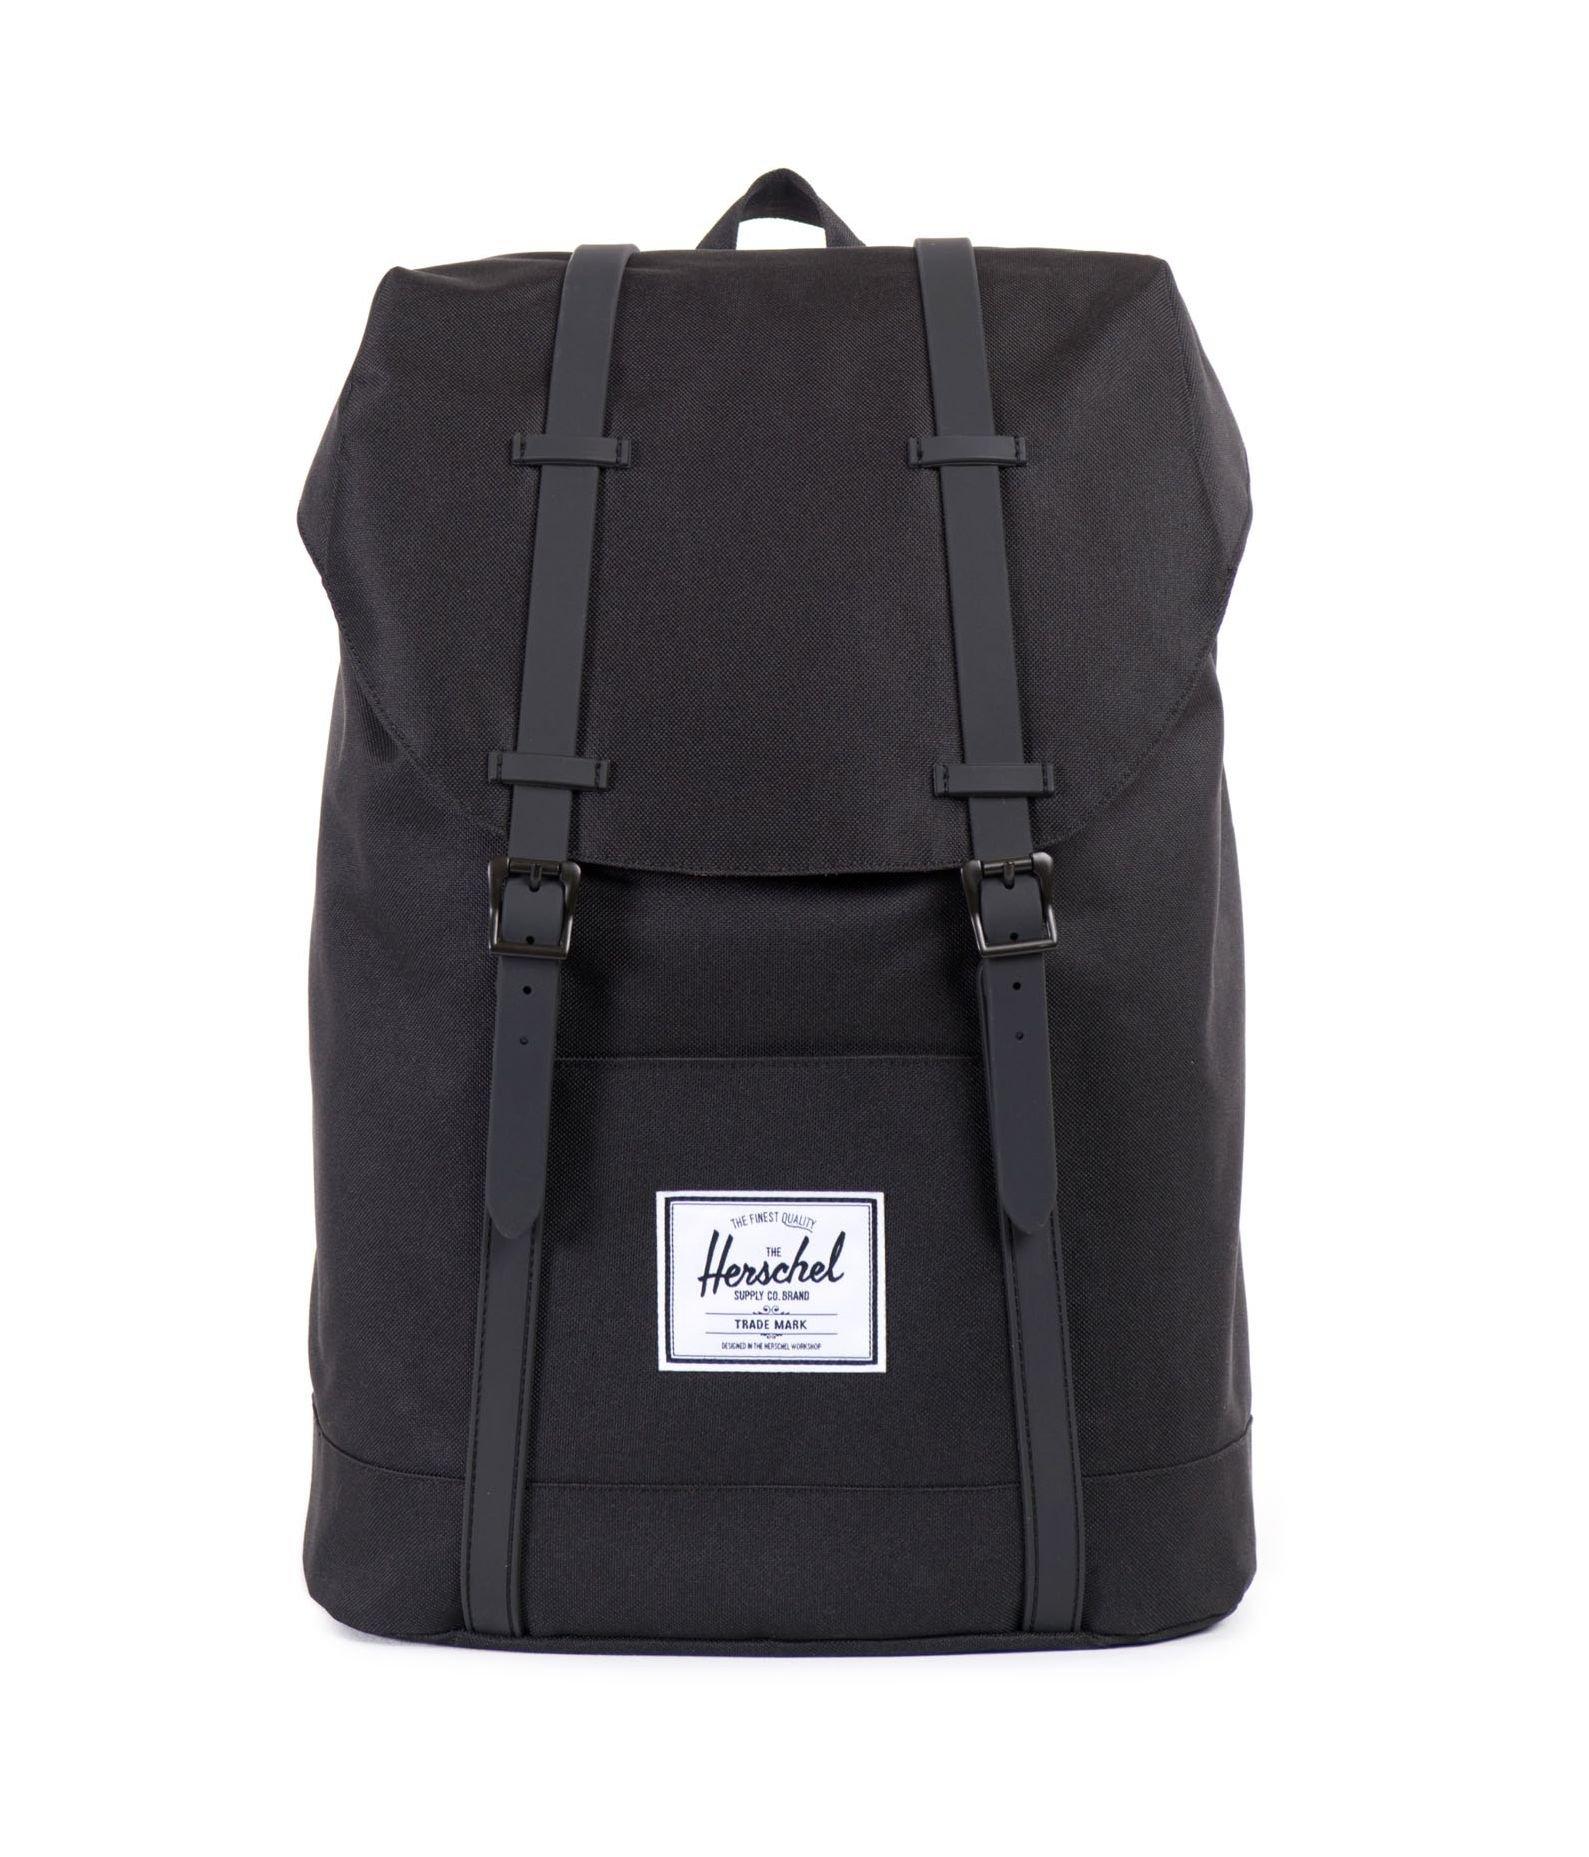 Herschel Supply Co. Retreat Backpack,Black/Black,One Size